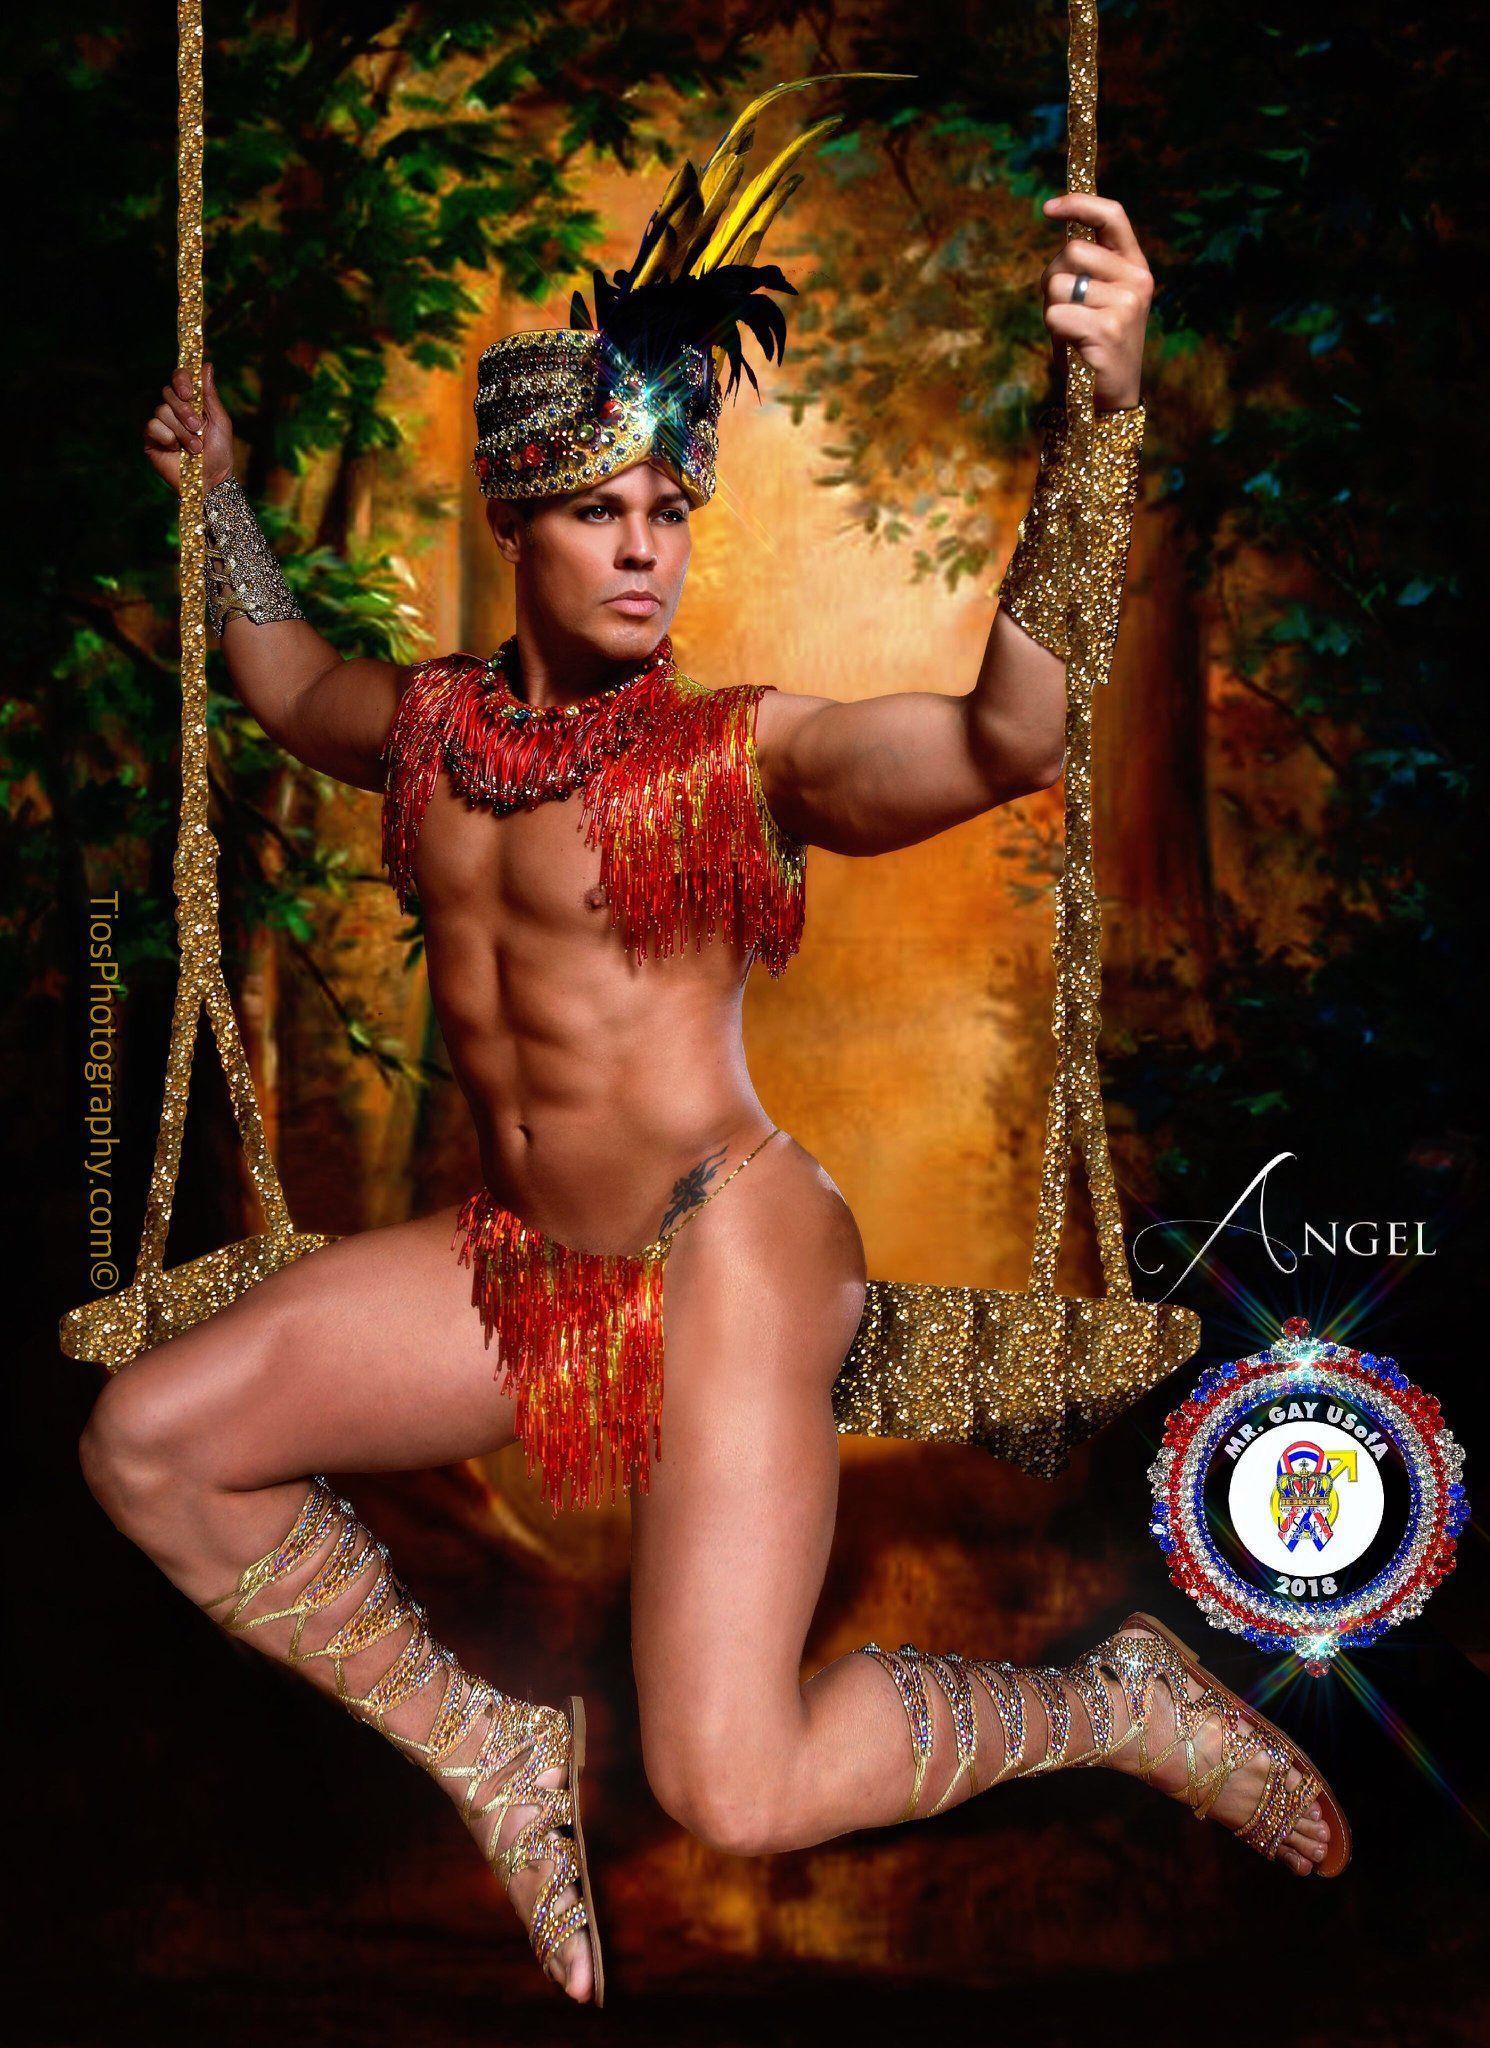 Angel Saez Amador